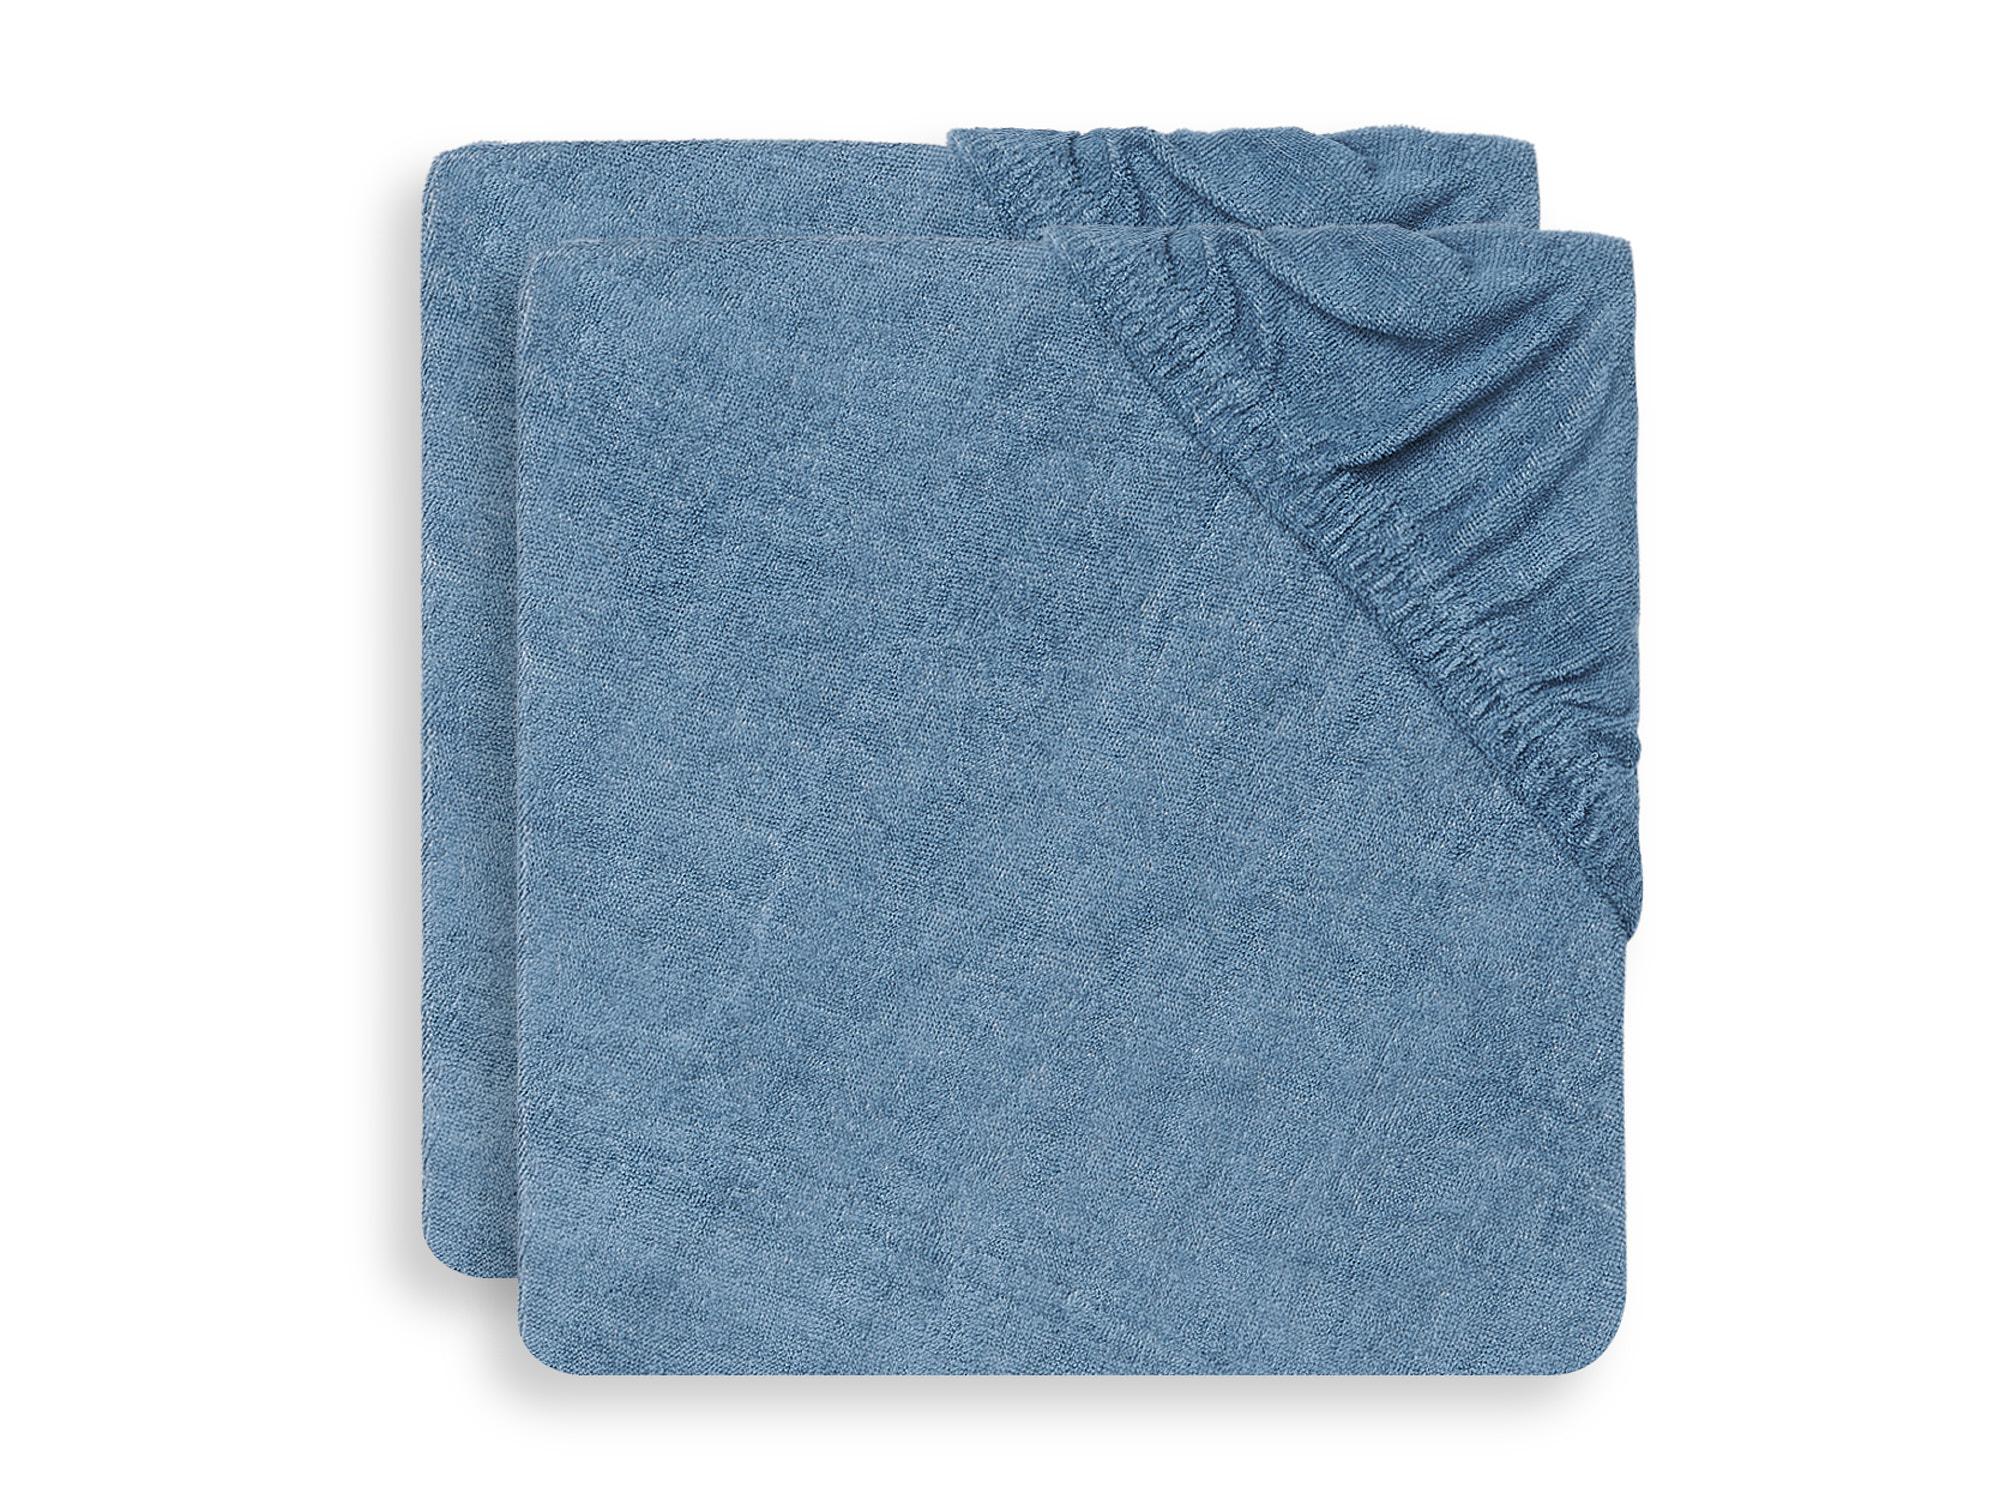 Afbeelding Jollein Aankleedkussenhoes 50x70cm I Jeans Blue (2pack)